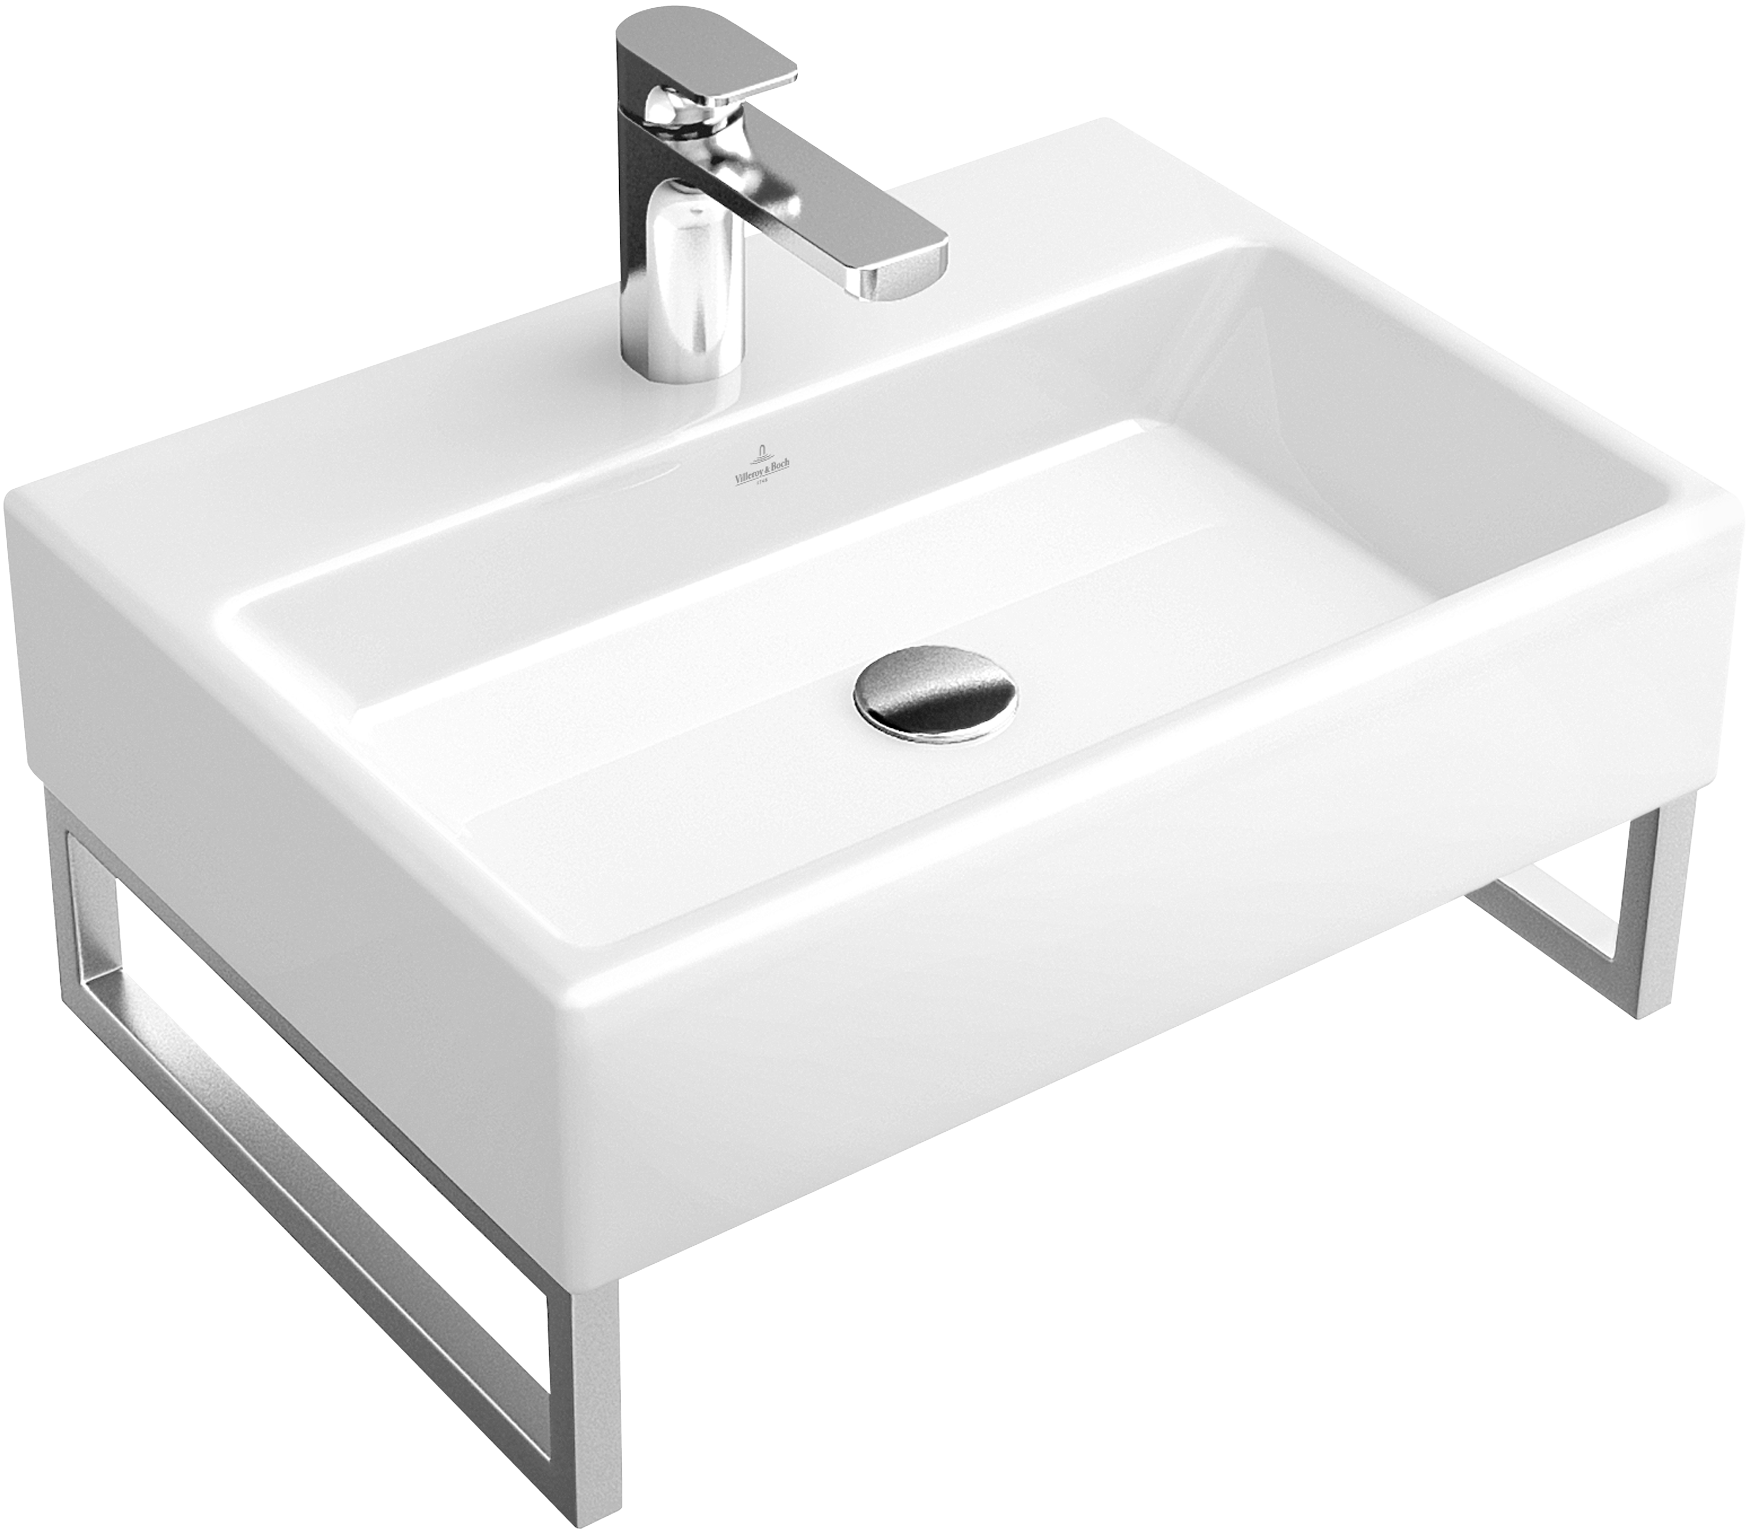 memento waschtisch eckig 513353 villeroy boch. Black Bedroom Furniture Sets. Home Design Ideas